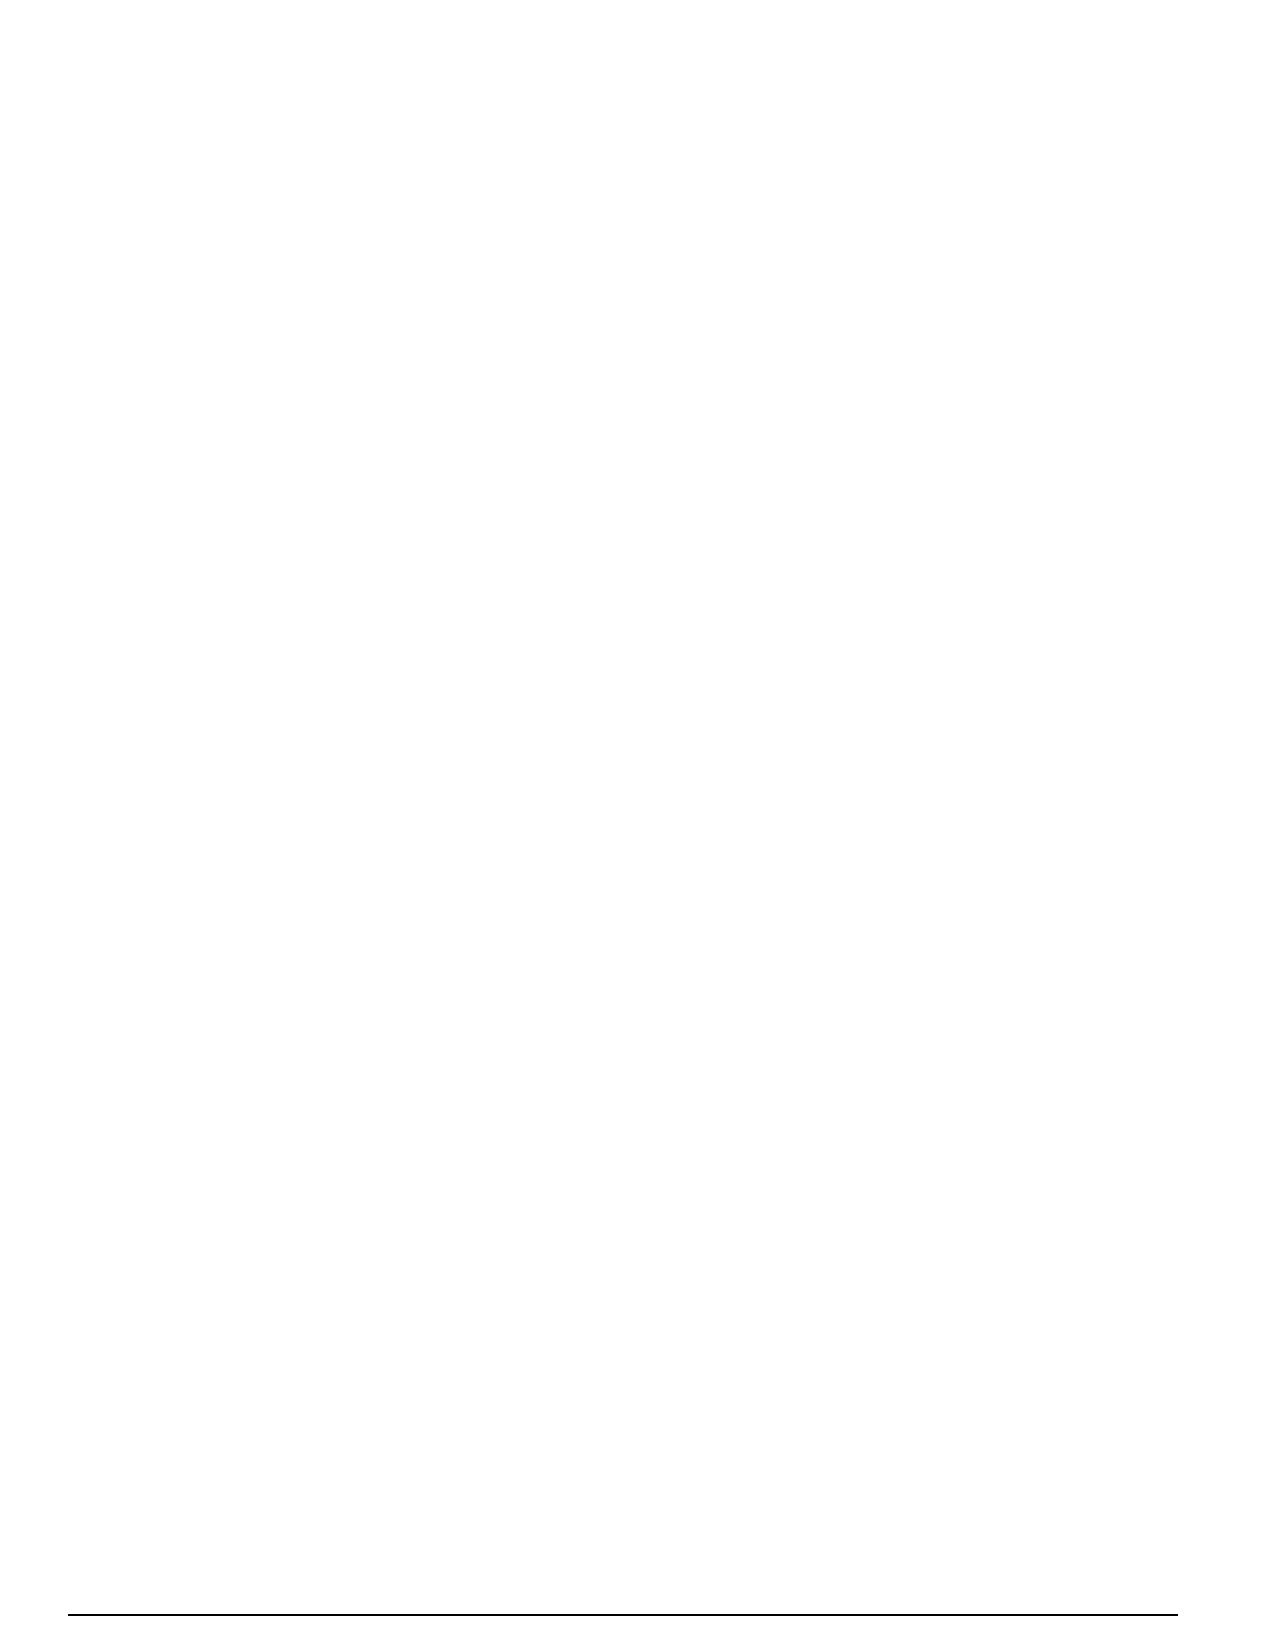 AD4016M162VSA-5 Даташит, Описание, Даташиты